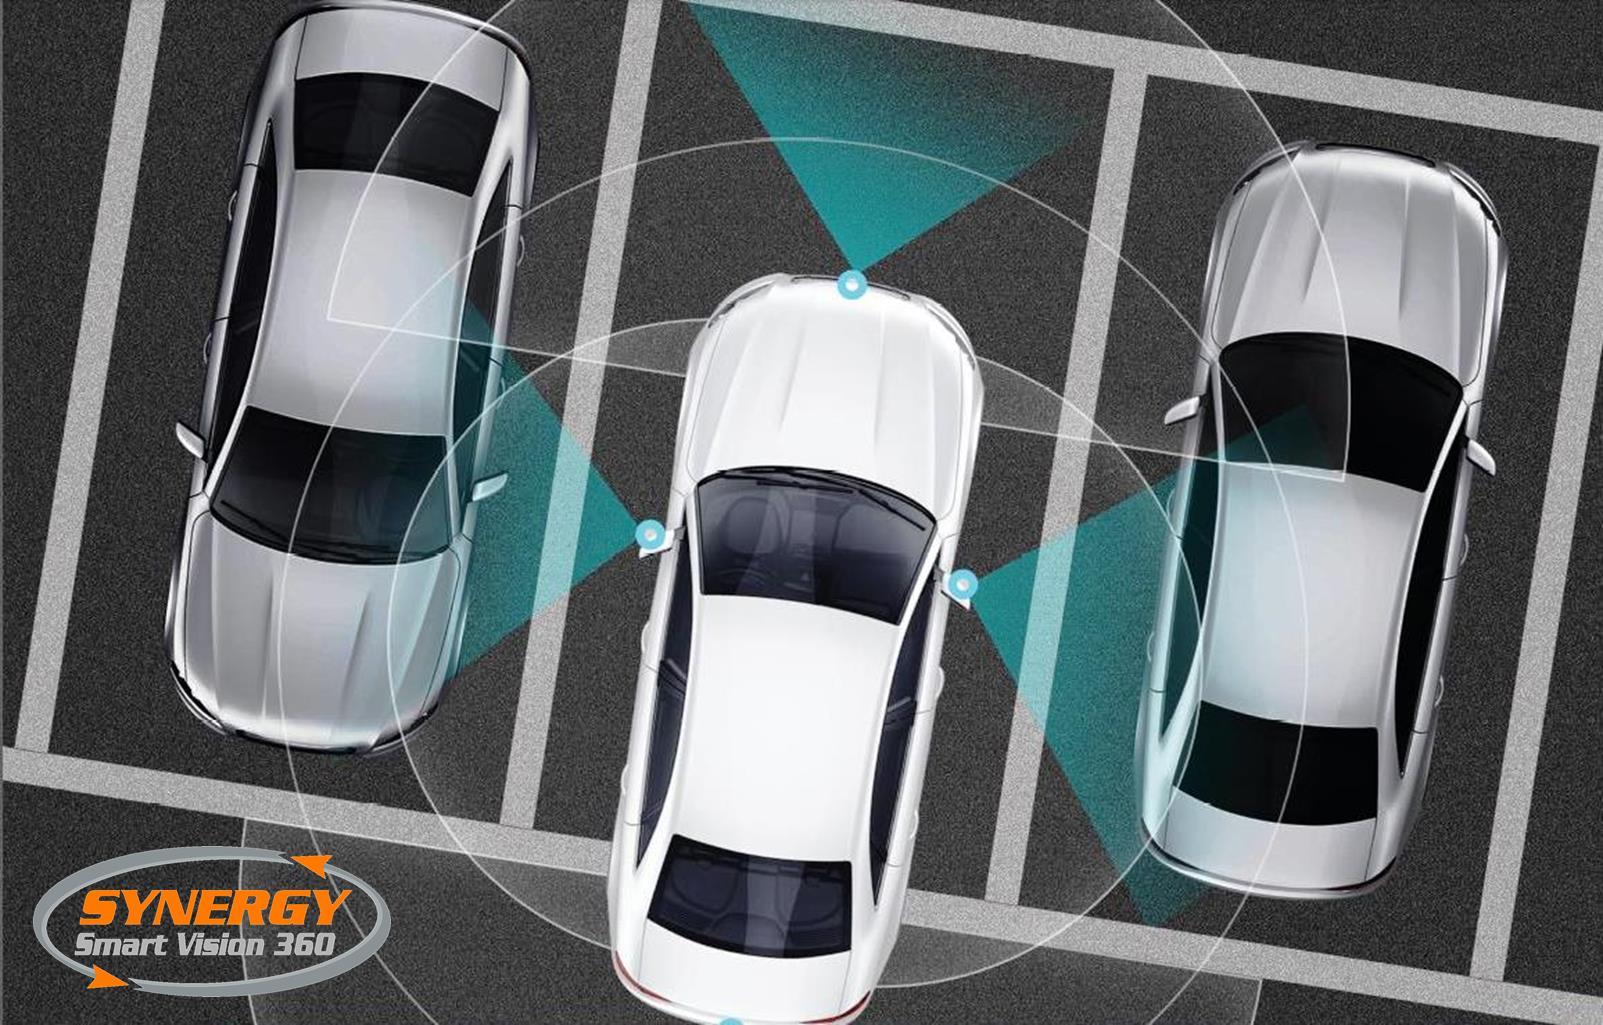 synergy-smart-vision-360.jpg